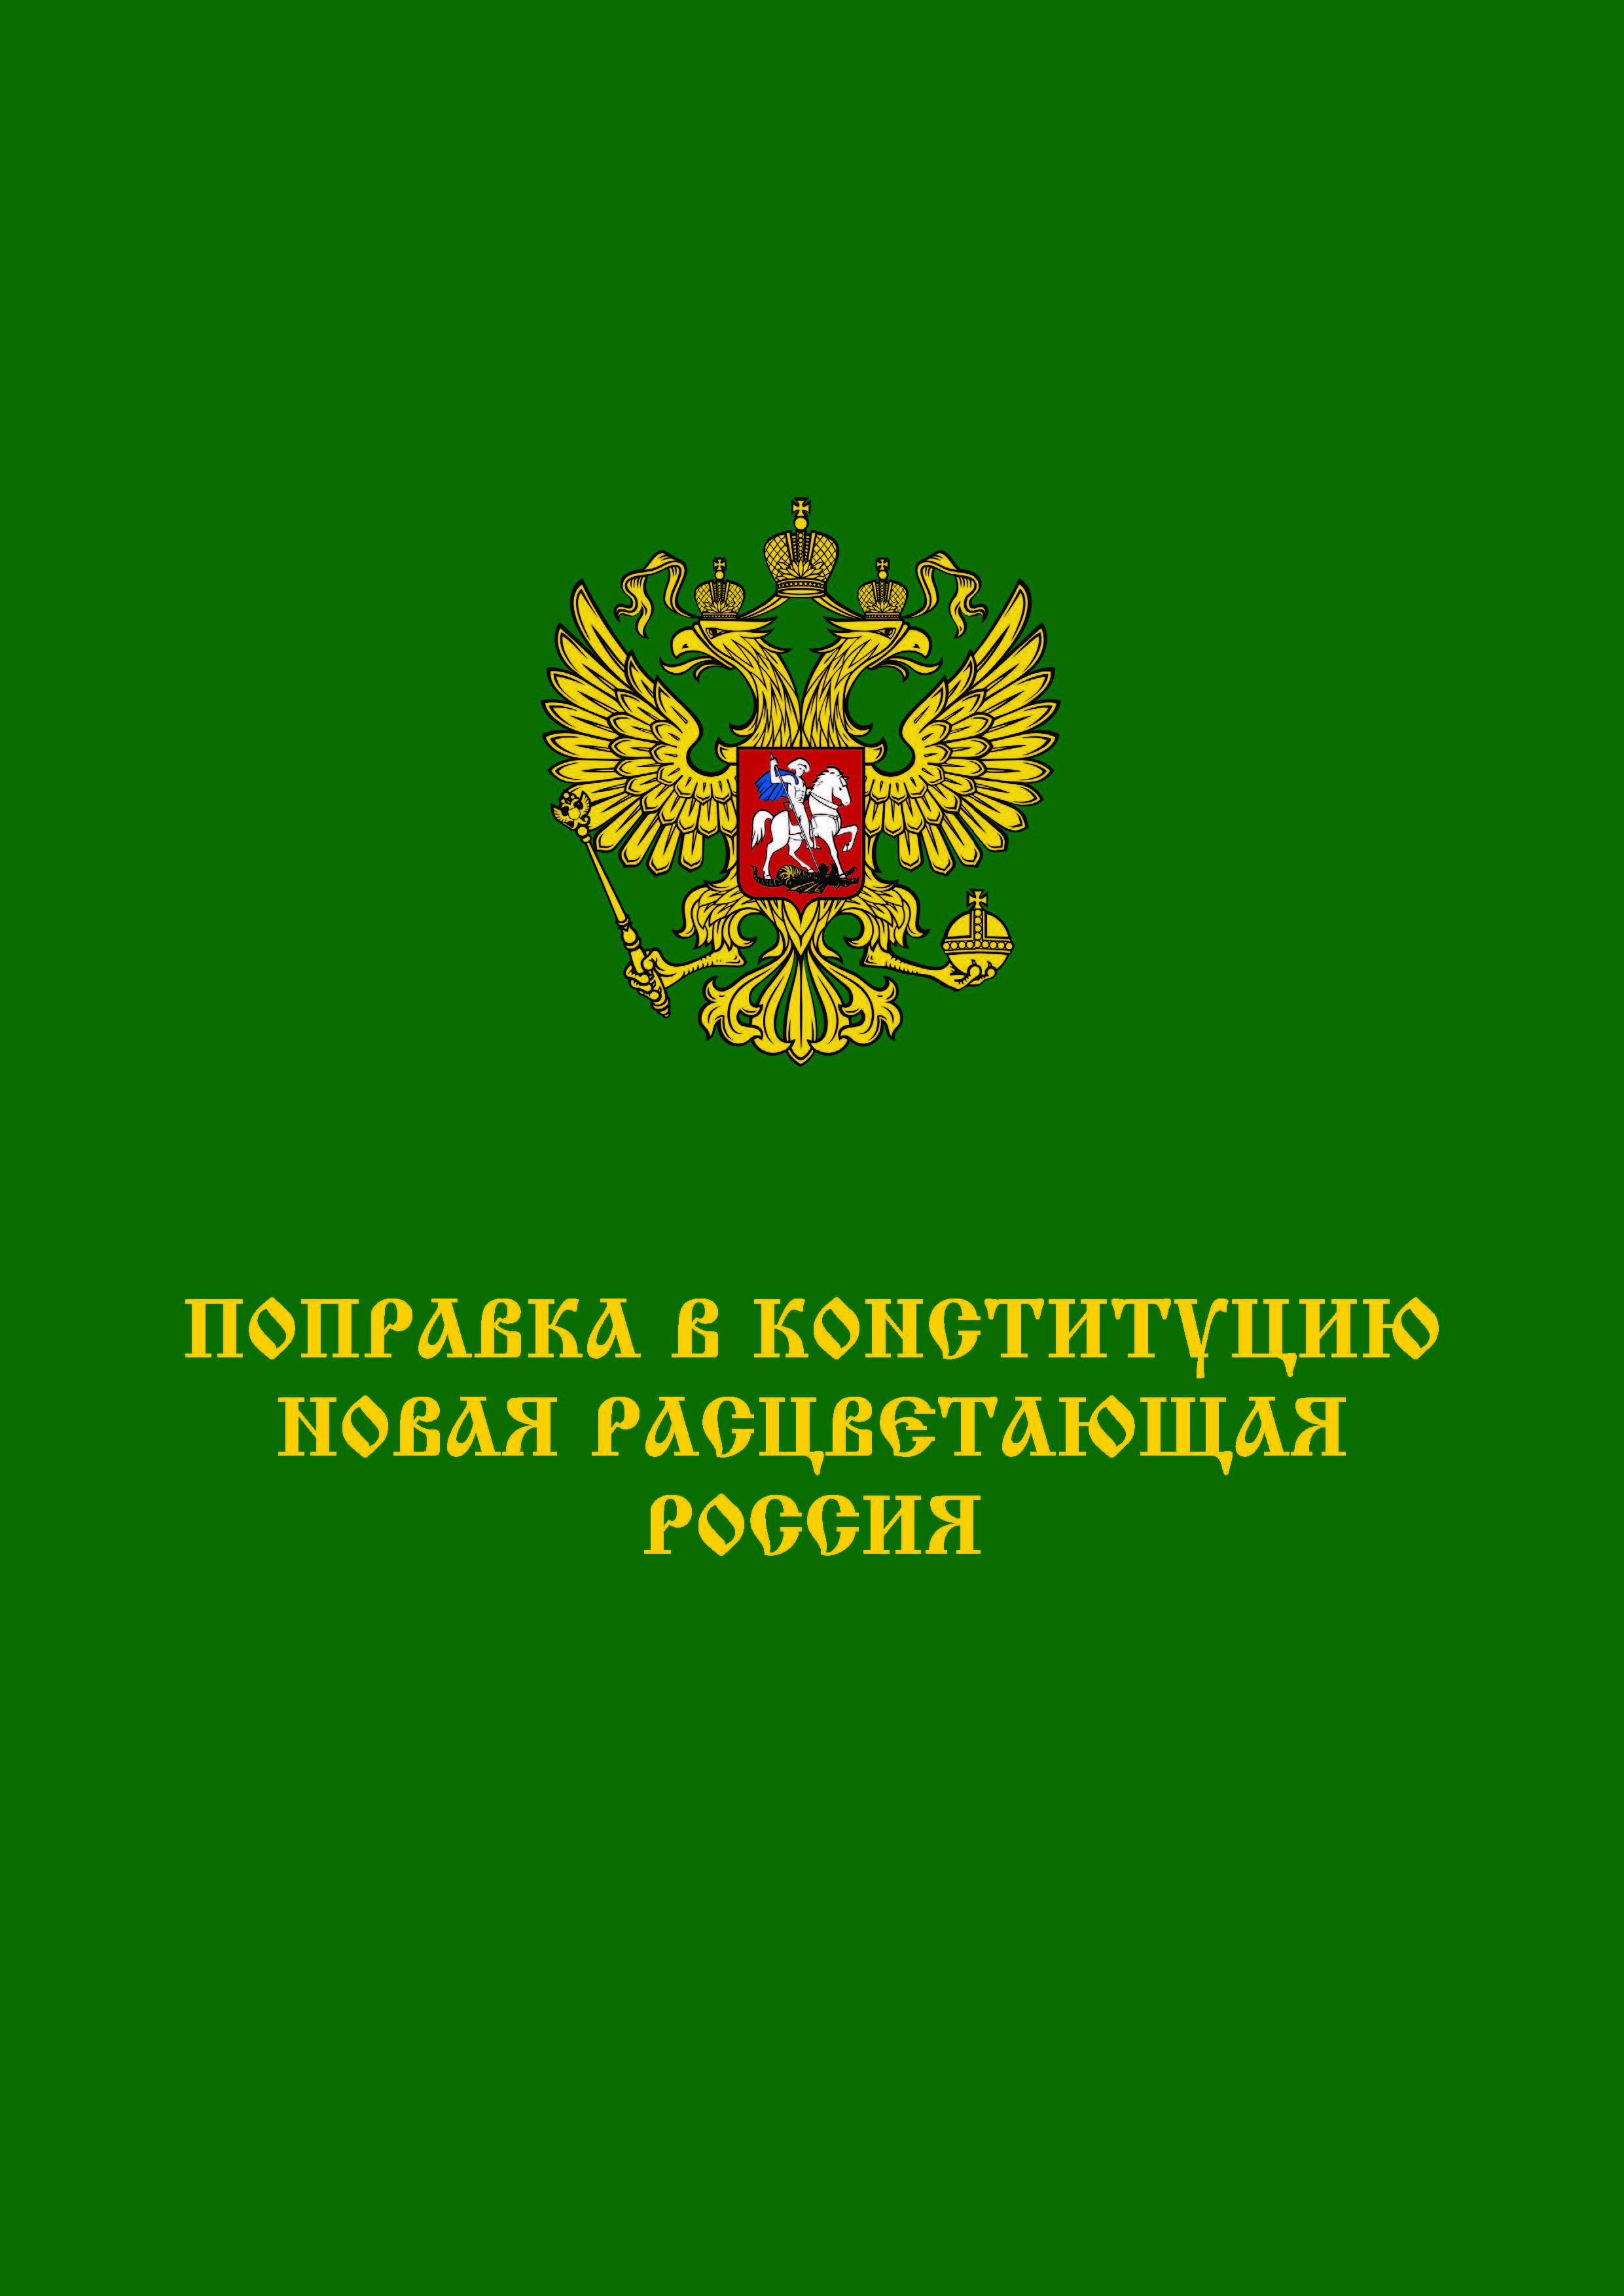 Фонд Поправка Конституция (1).jpg